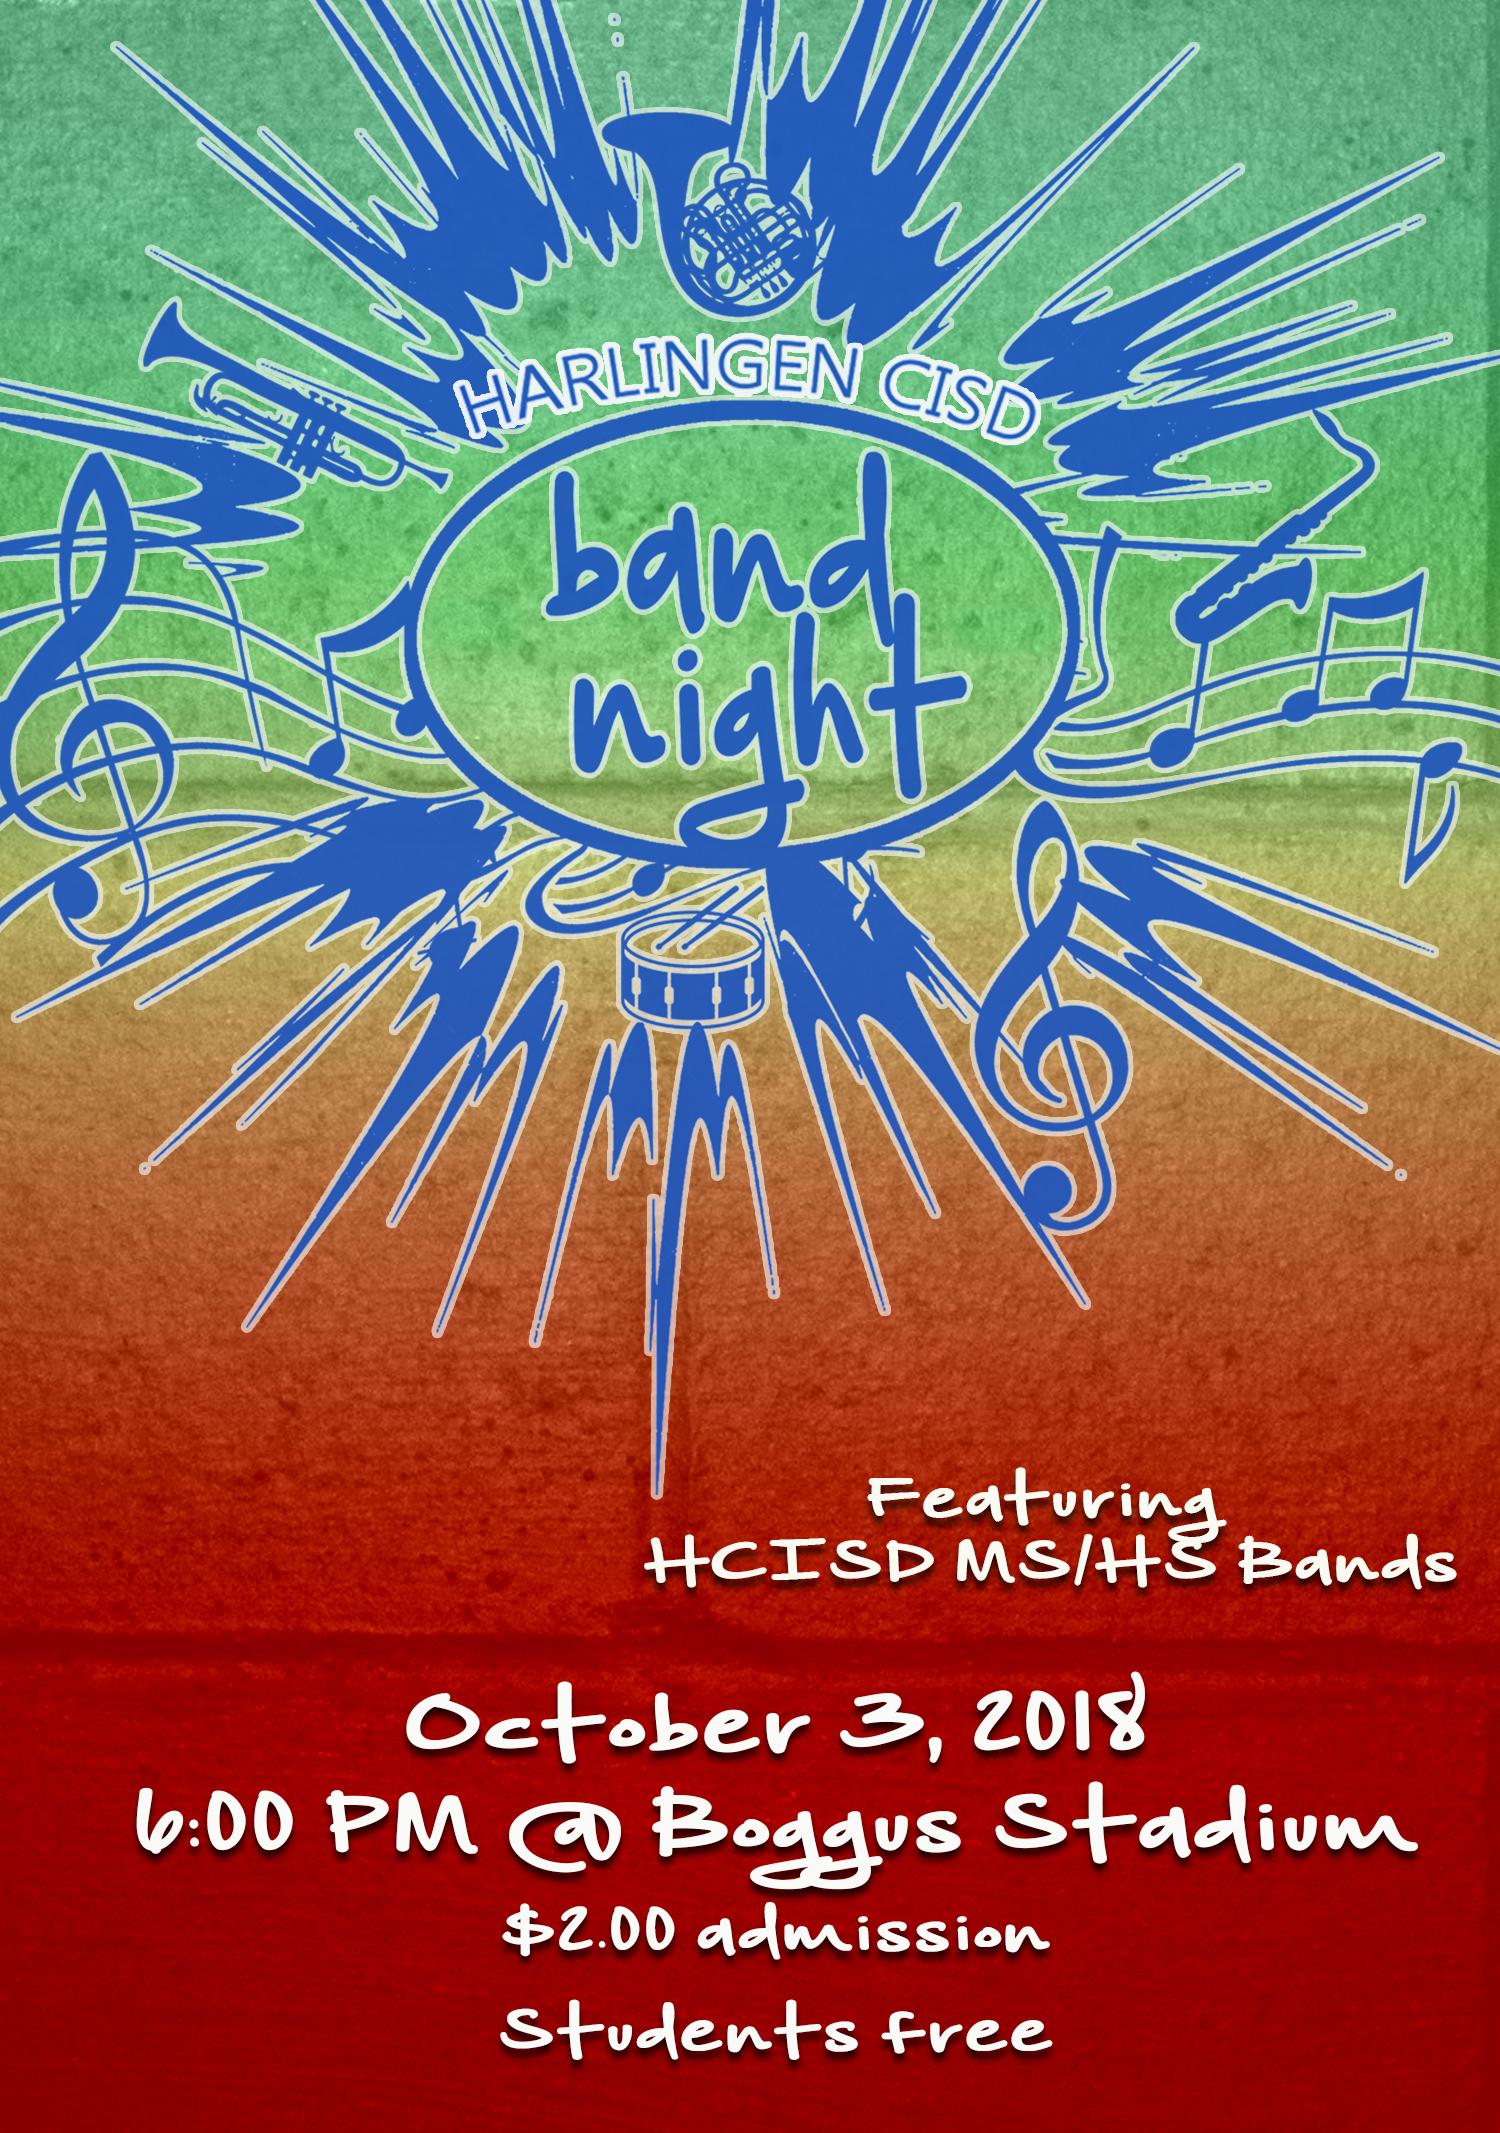 HCISD invites the community to Band Night 2018